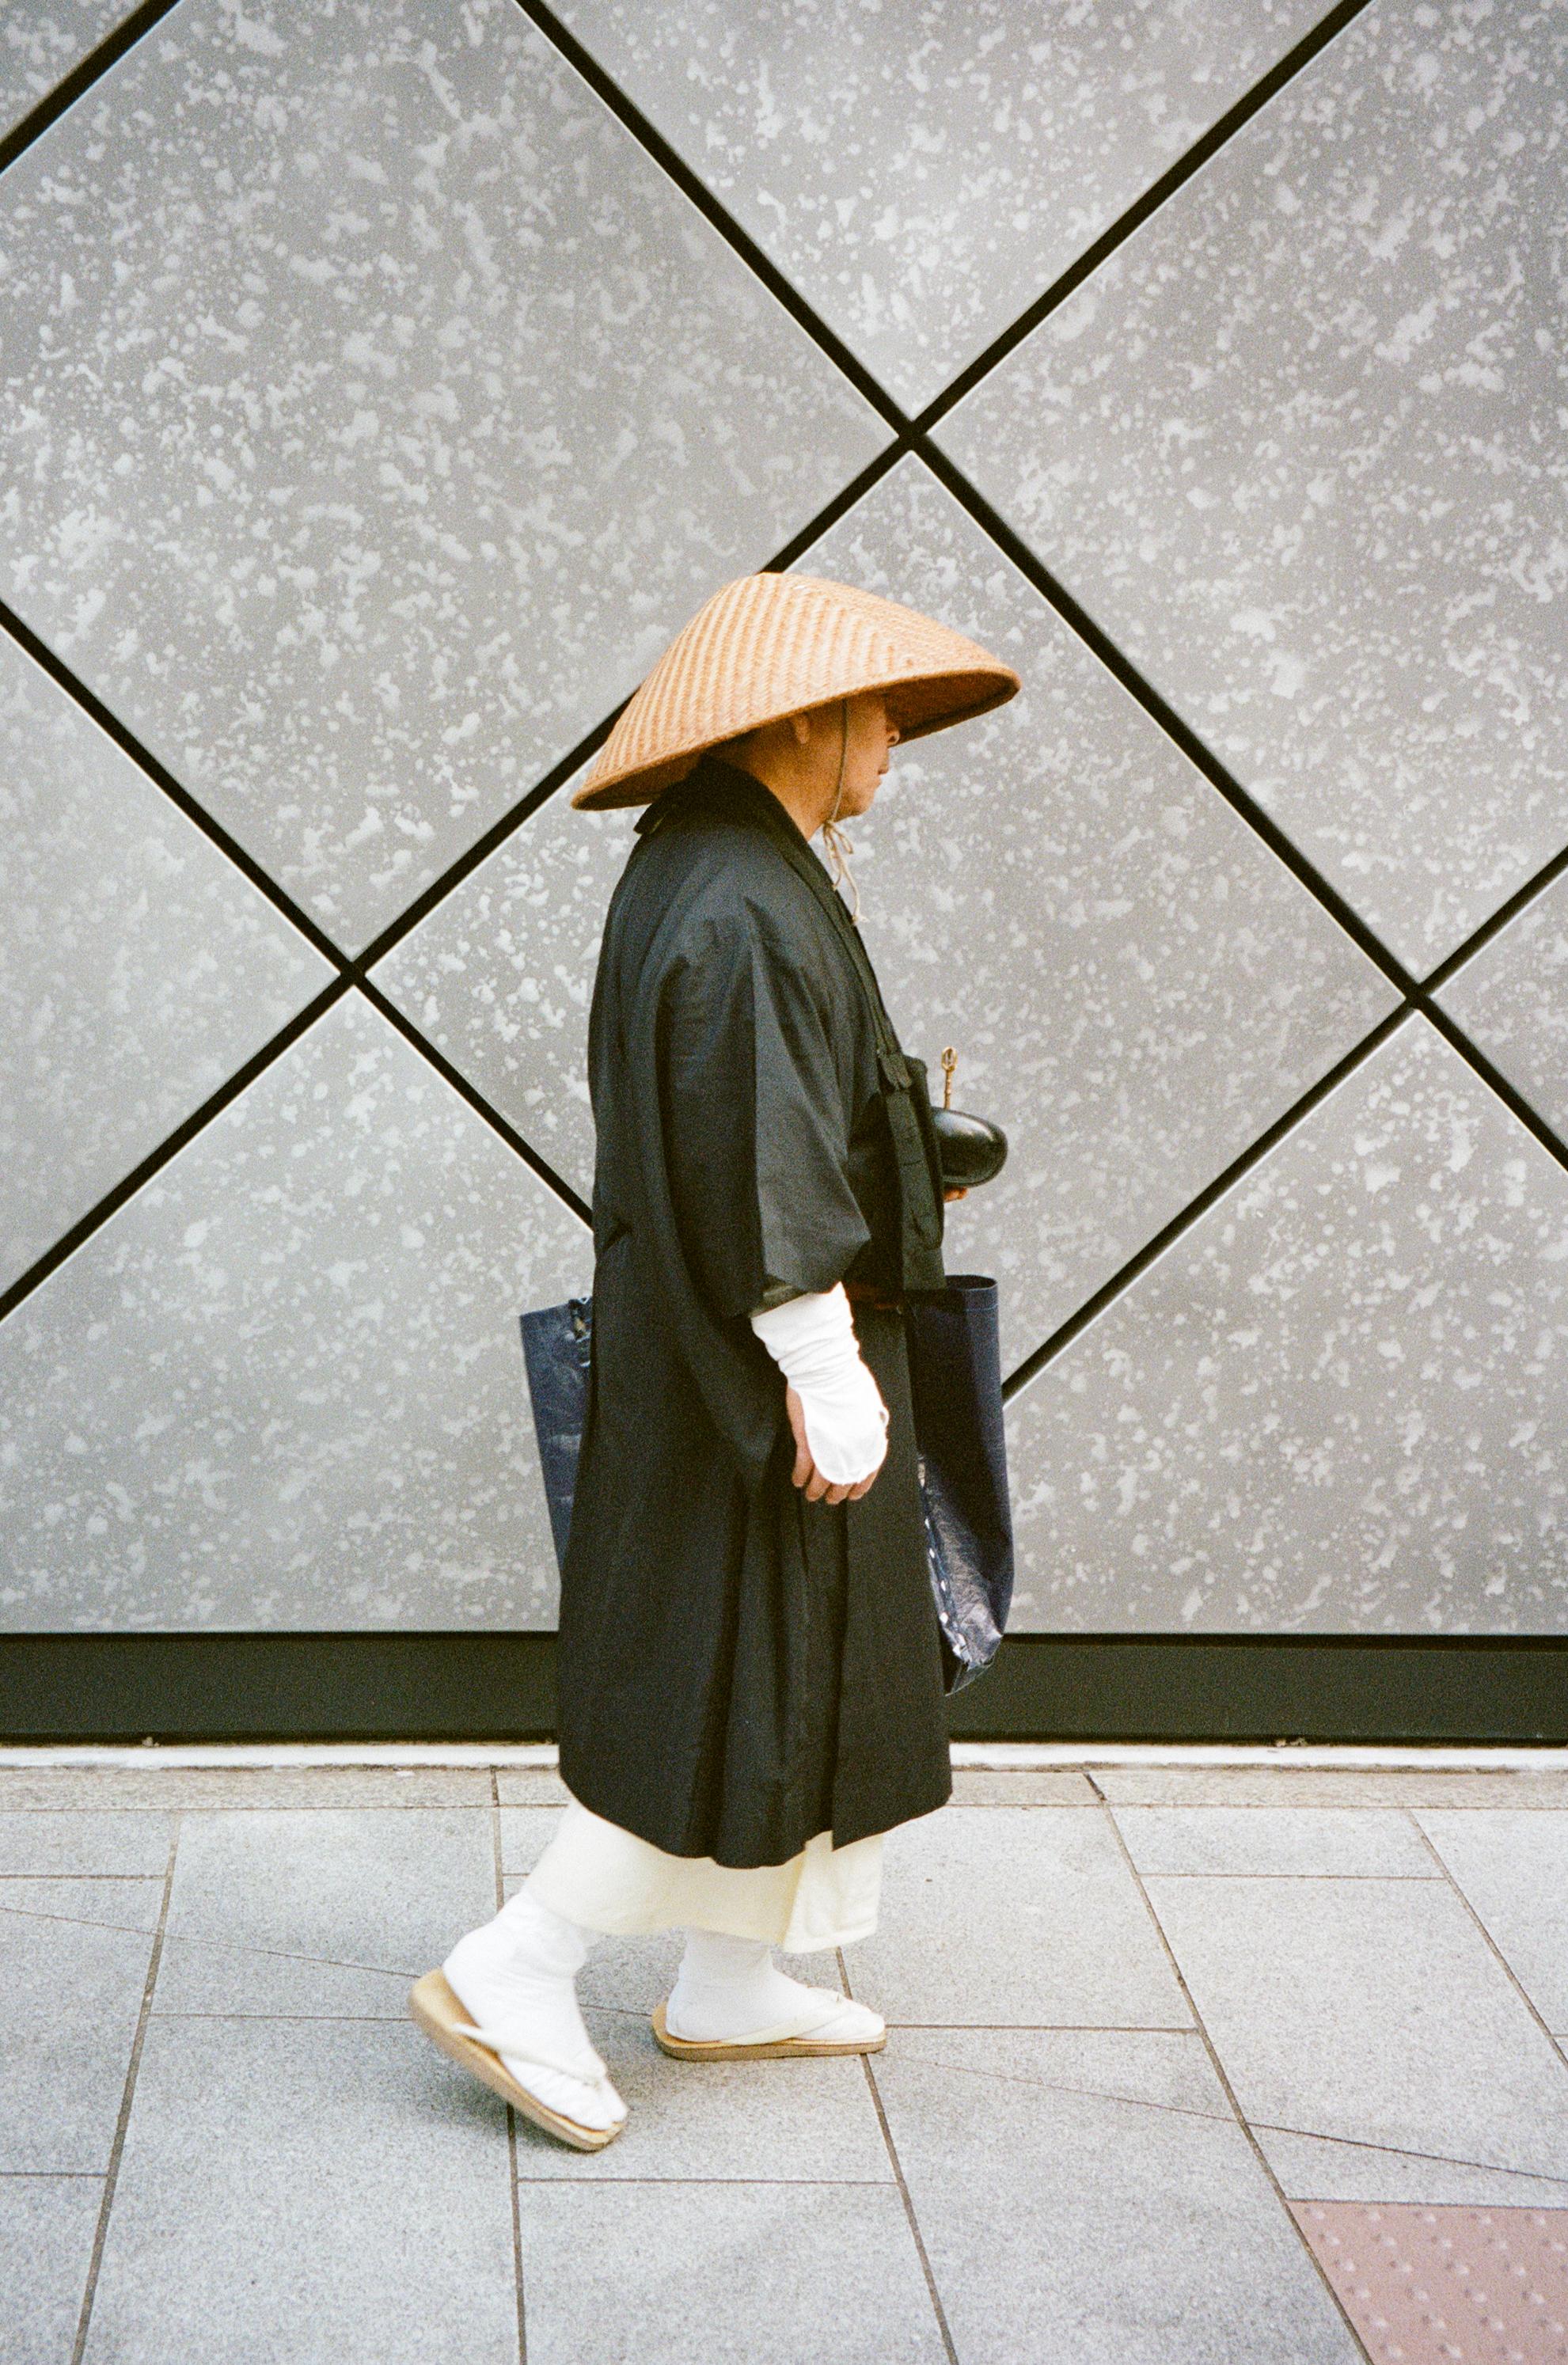 Japan_35mm-26.jpg